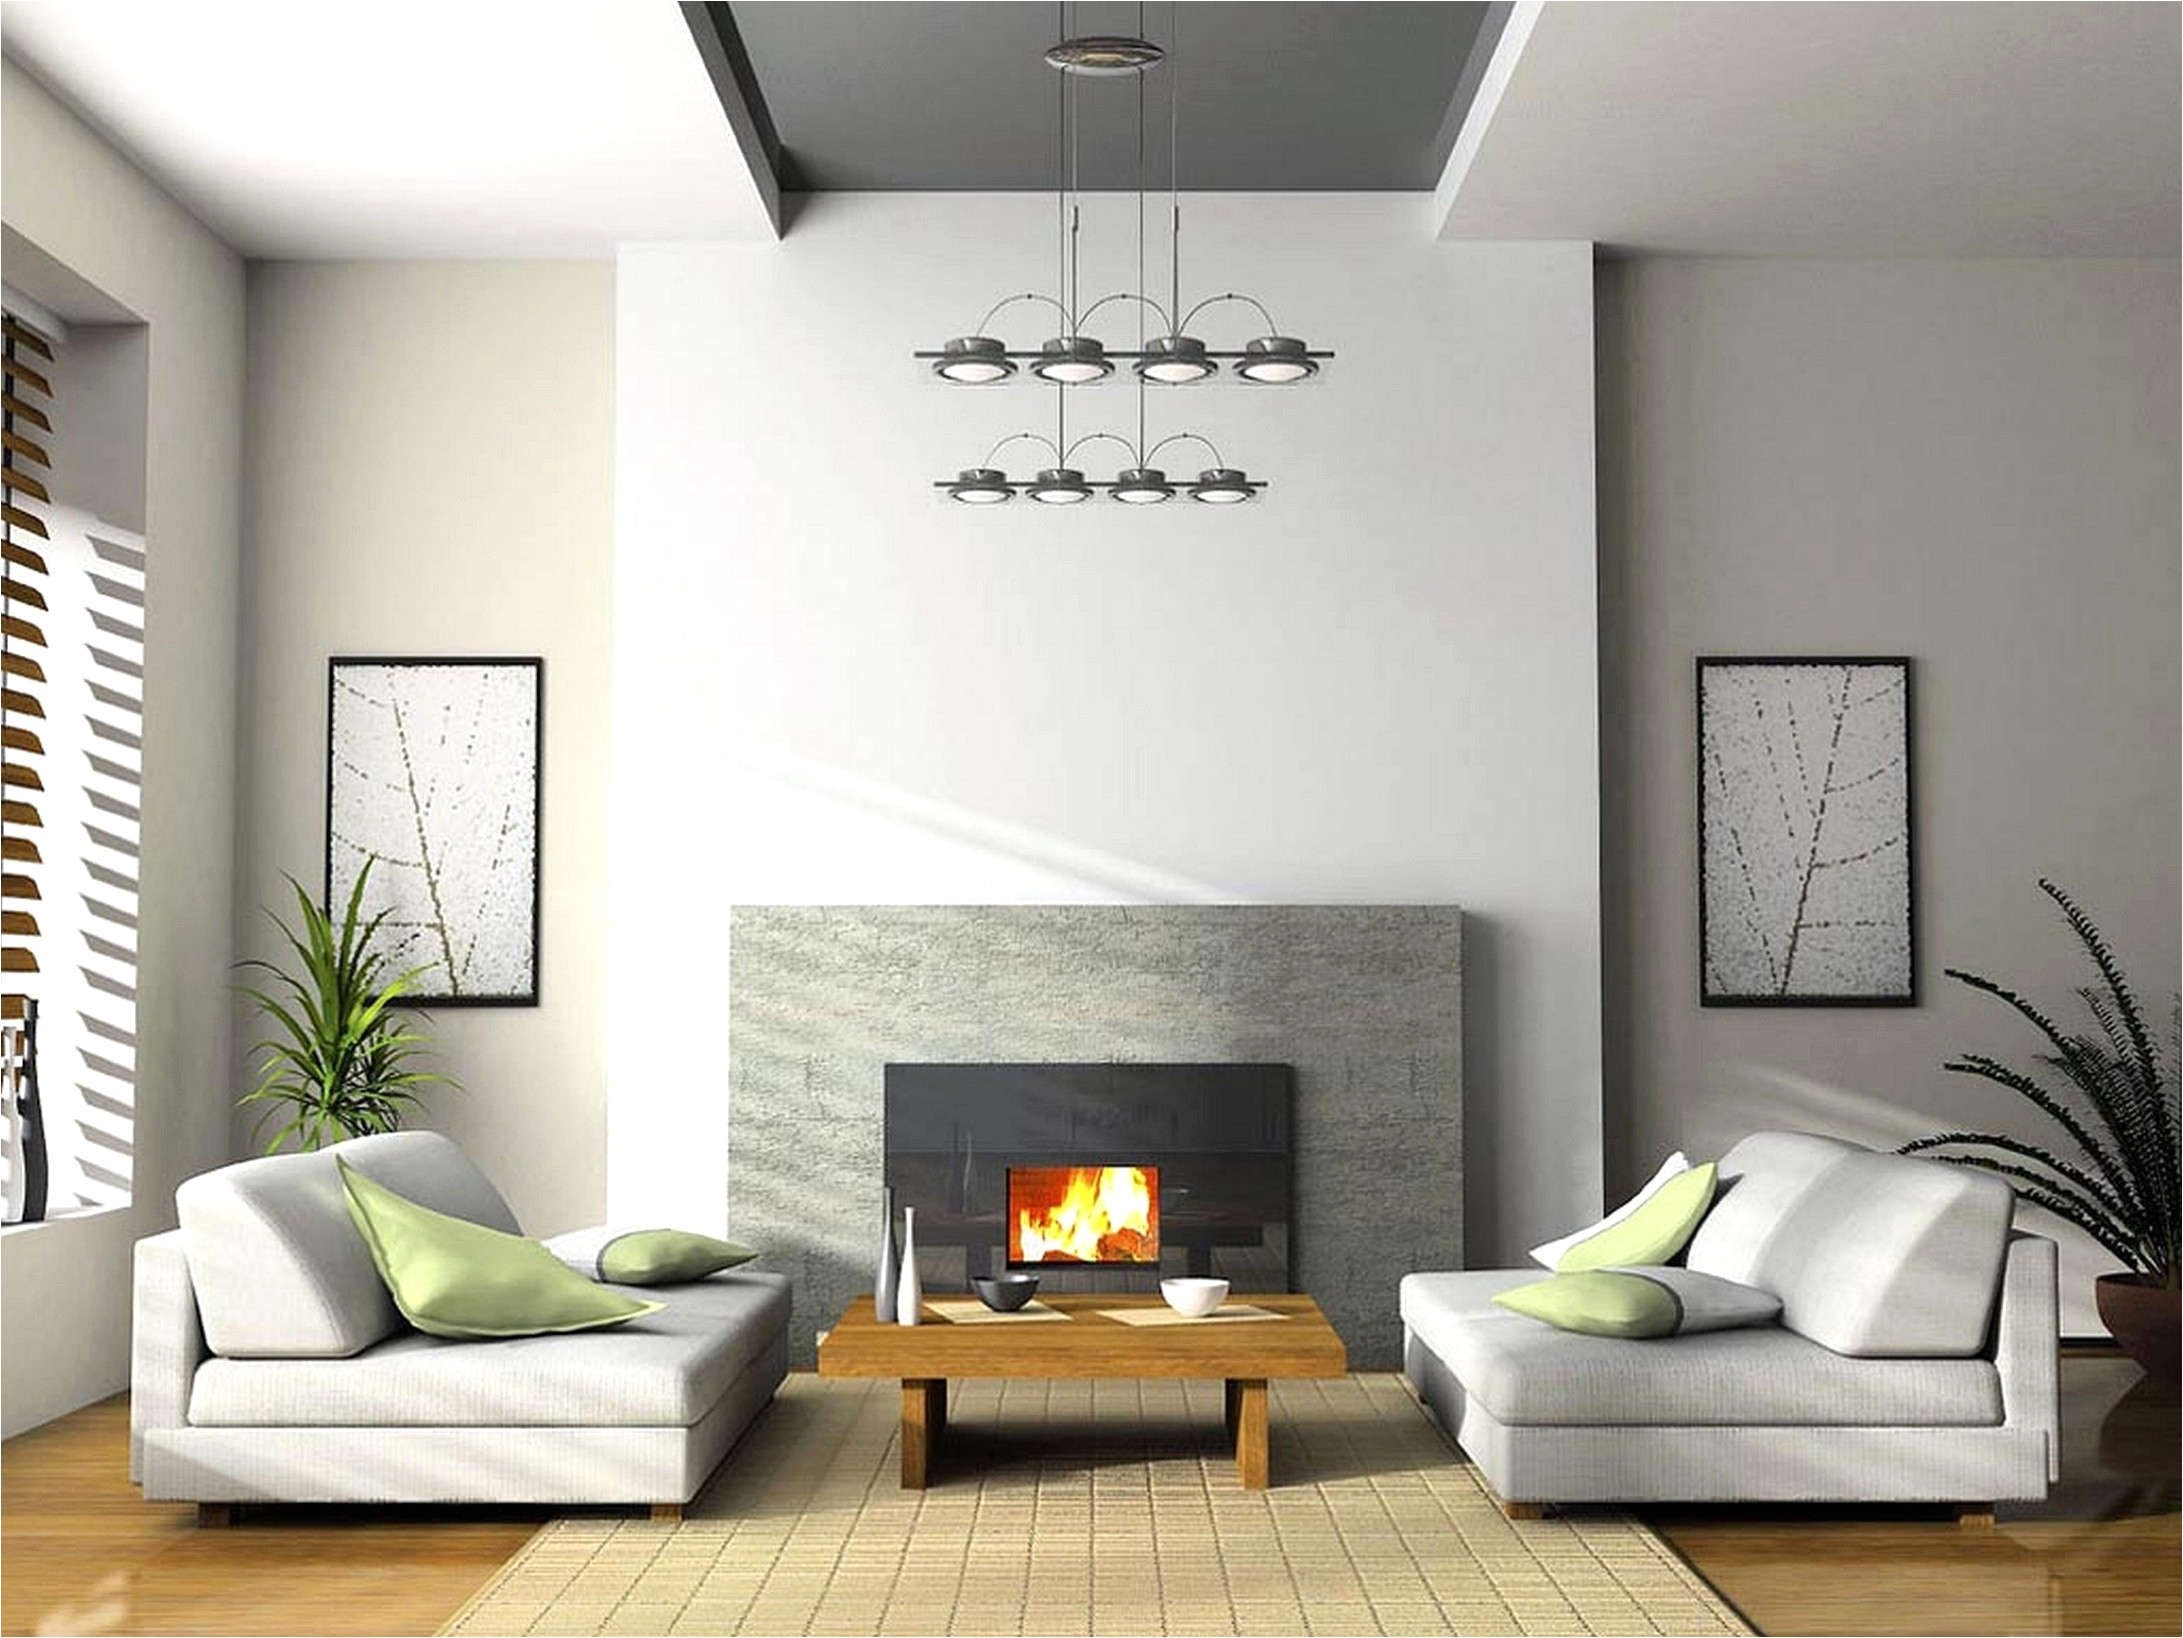 Living Room Design Ideas A Bud Beautiful Living Room Decor Ideas Unique Shaker Chairs 0d